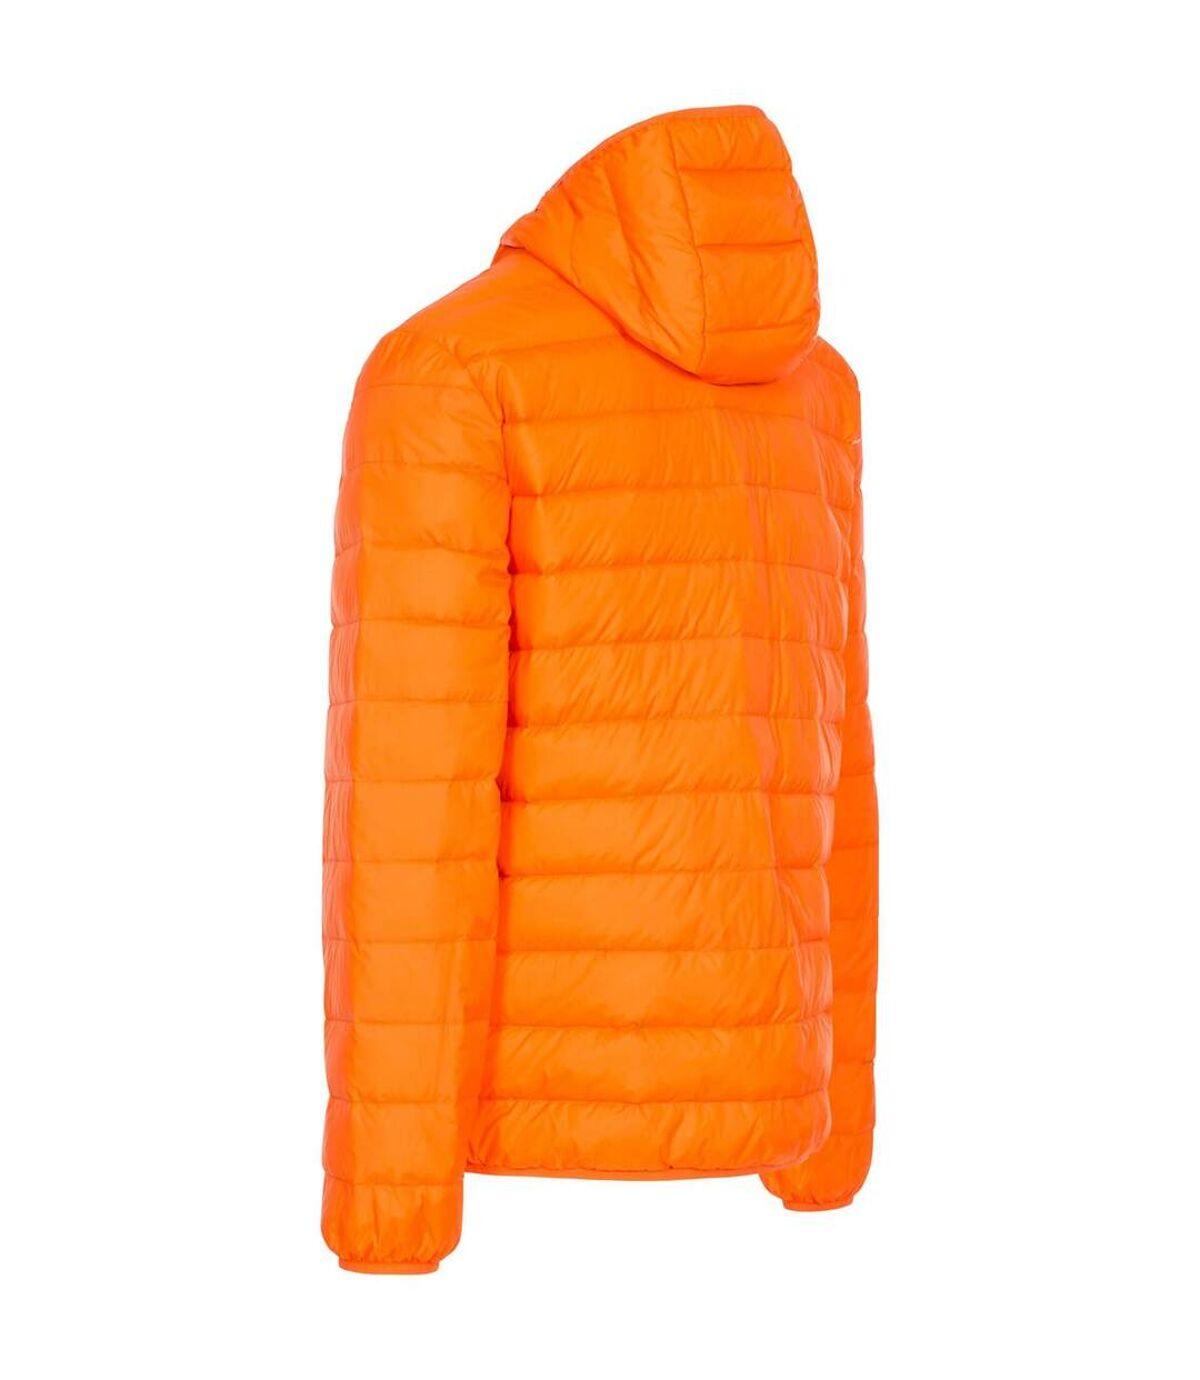 Trespass Mens Stanley Down Jacket (Orange) - UTTP5164